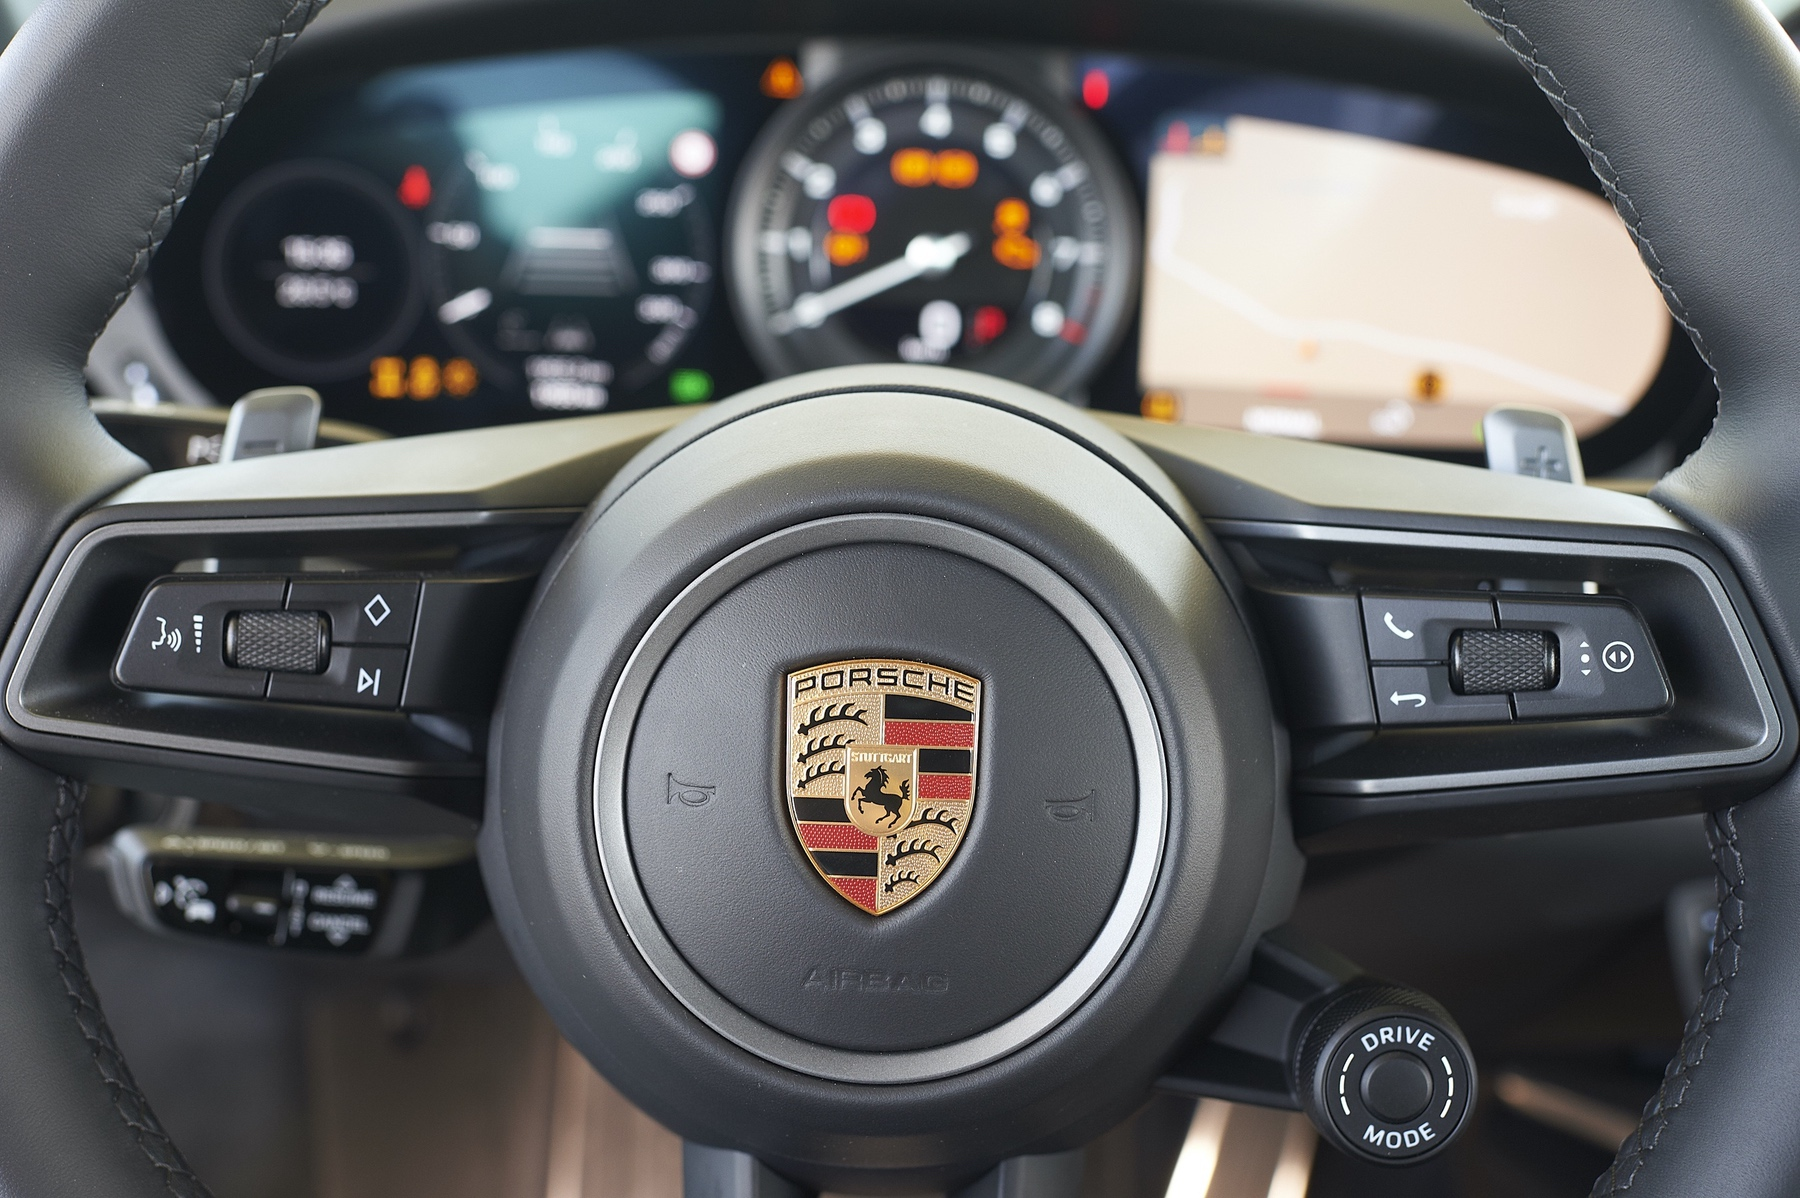 Test_Drive_Porsche_911_Athens_0197